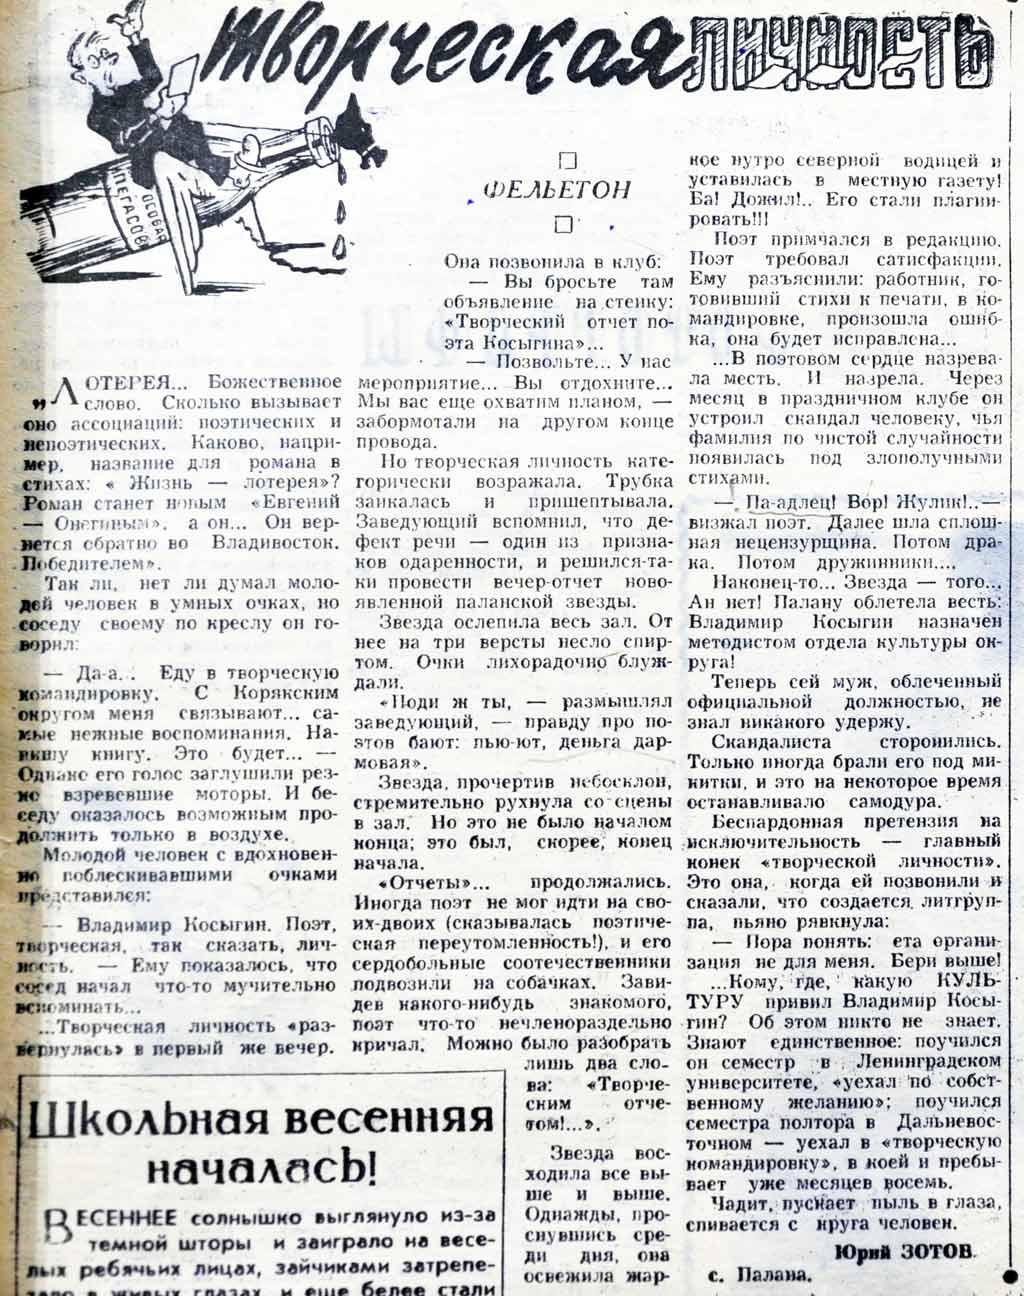 kk-1961-01